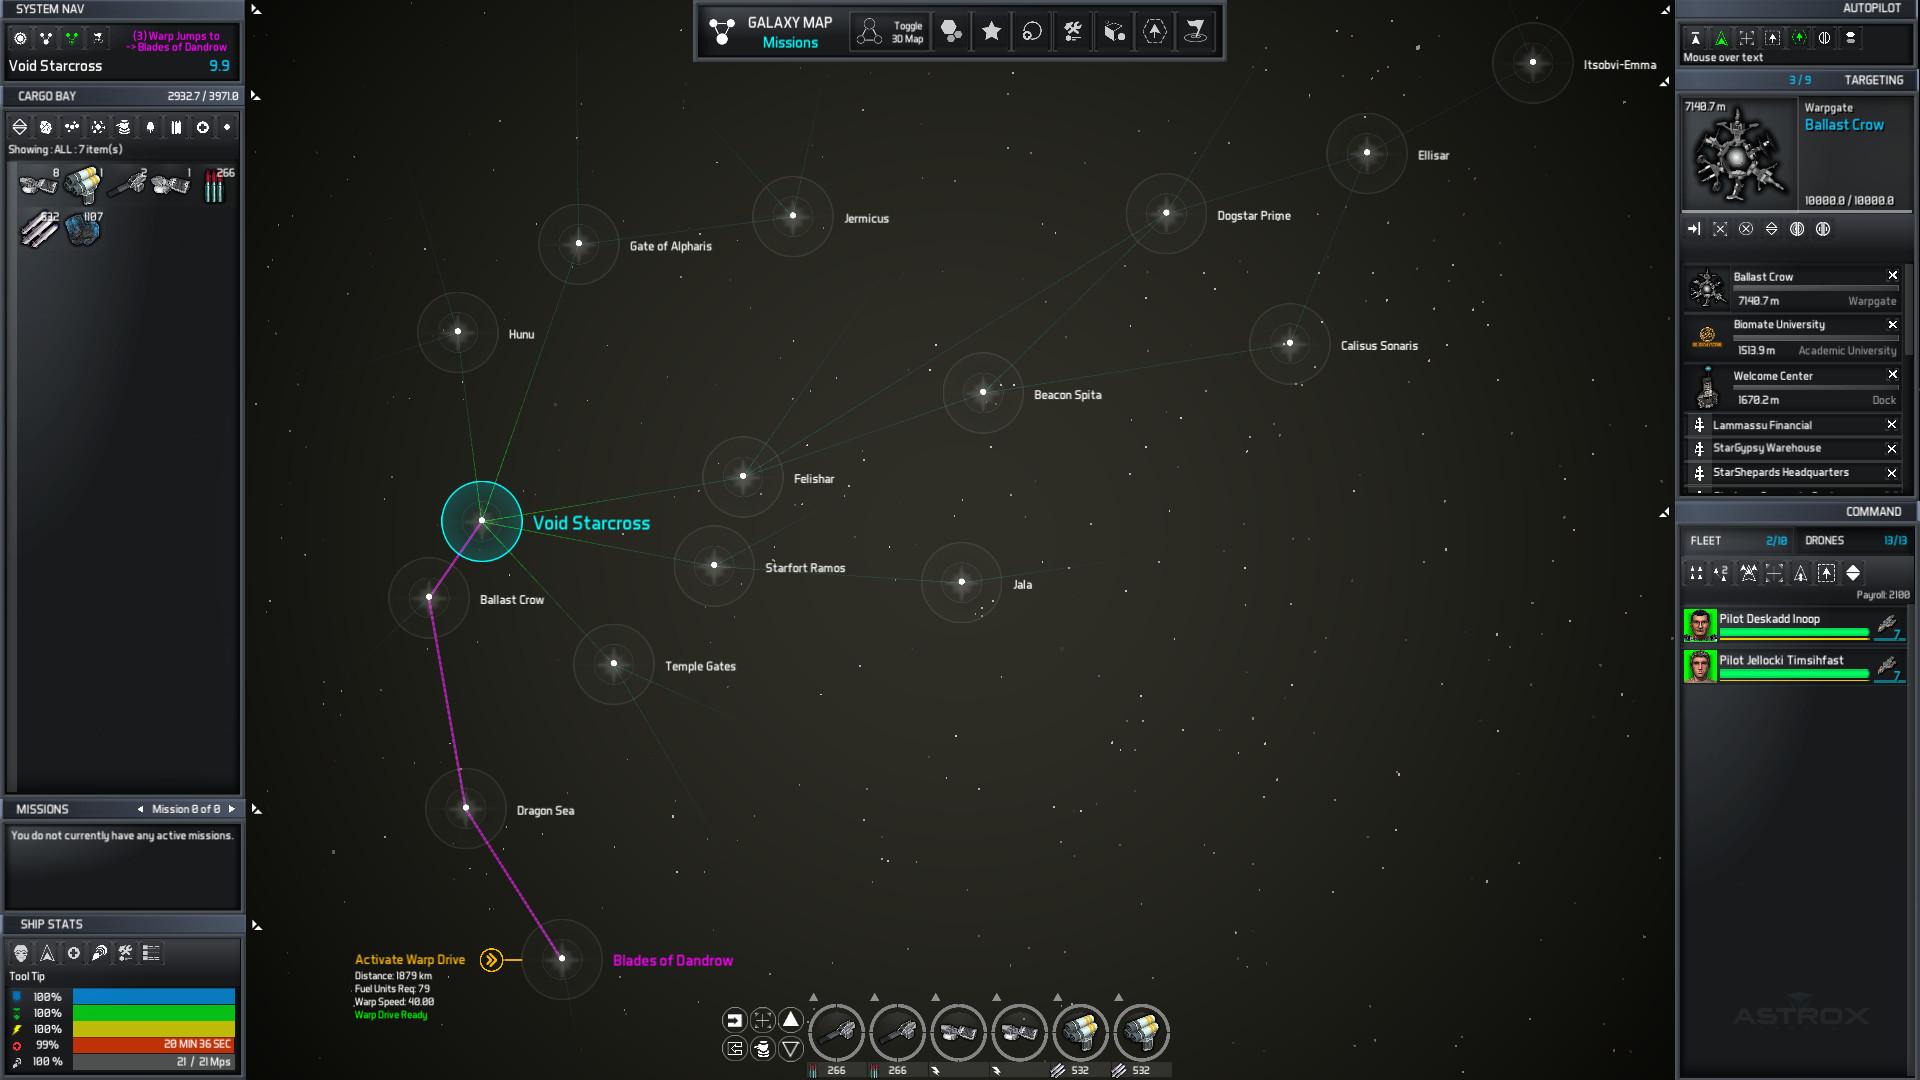 Astrox Imperium Fiyat Karşılaştırma